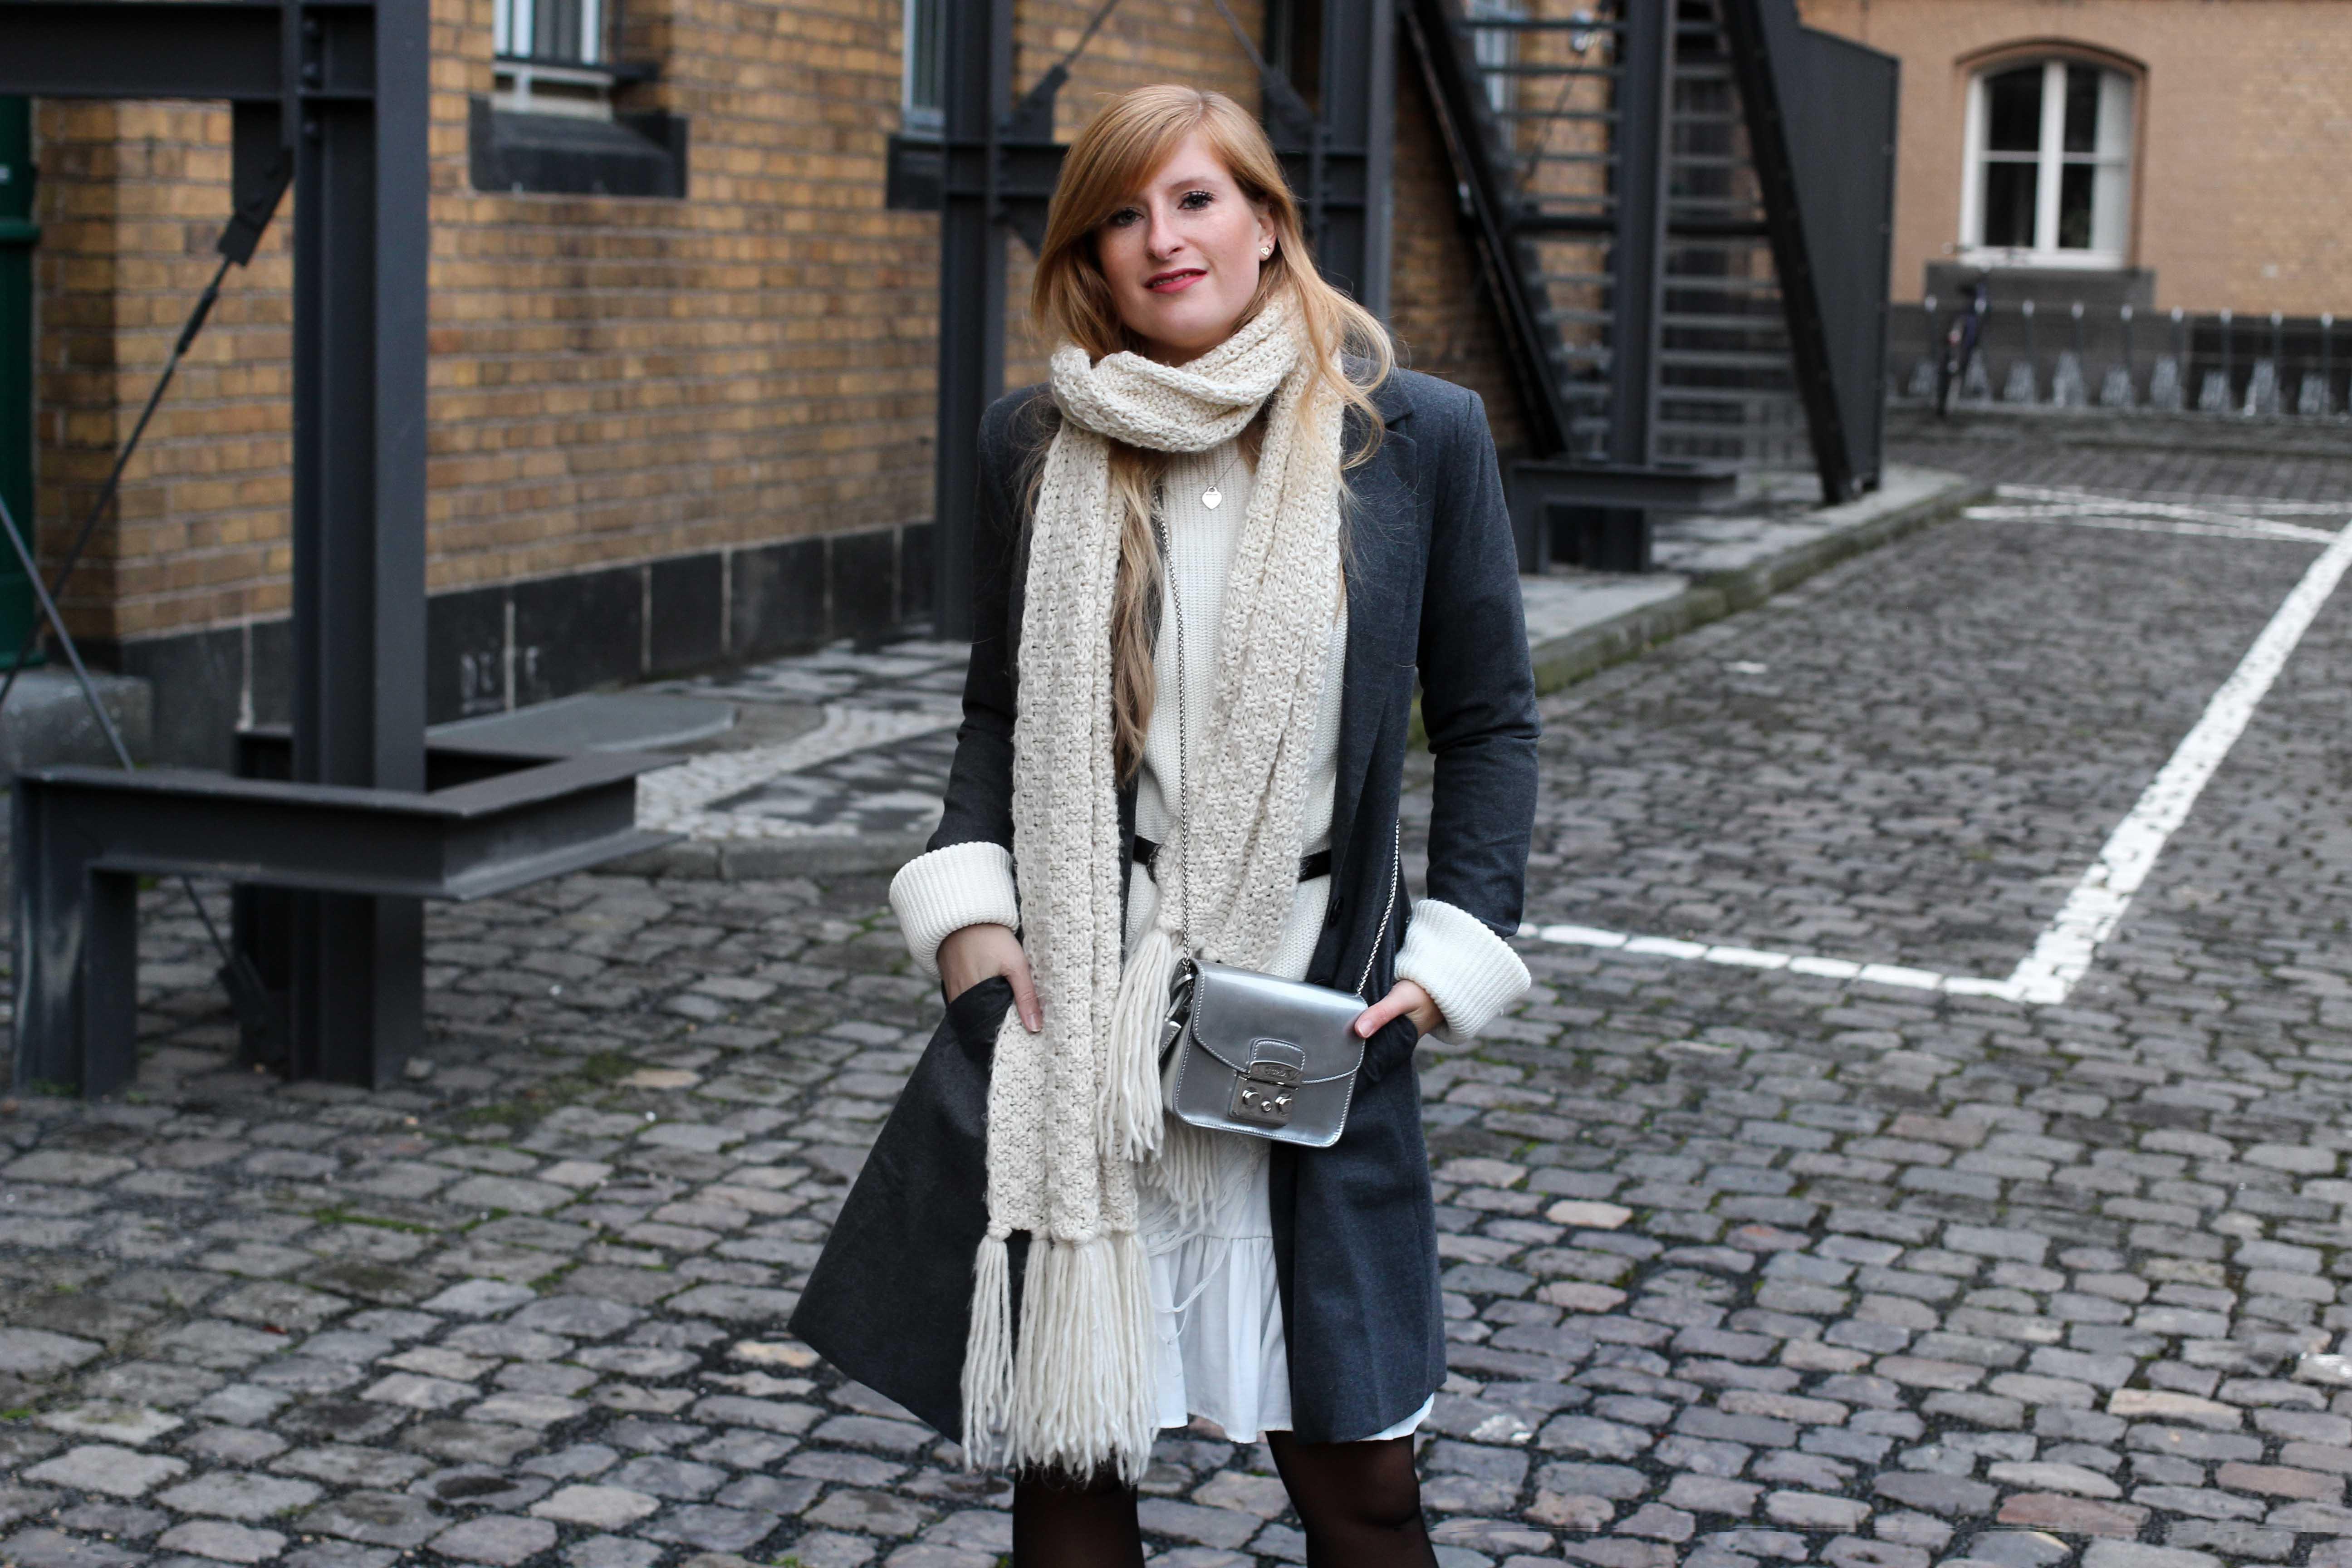 Winter-Layering weißes Kleid, Ripped Pullover Asos schwarze Strumpfhose Hunkemöller kombinieren Outfit Modeblog bonn 7